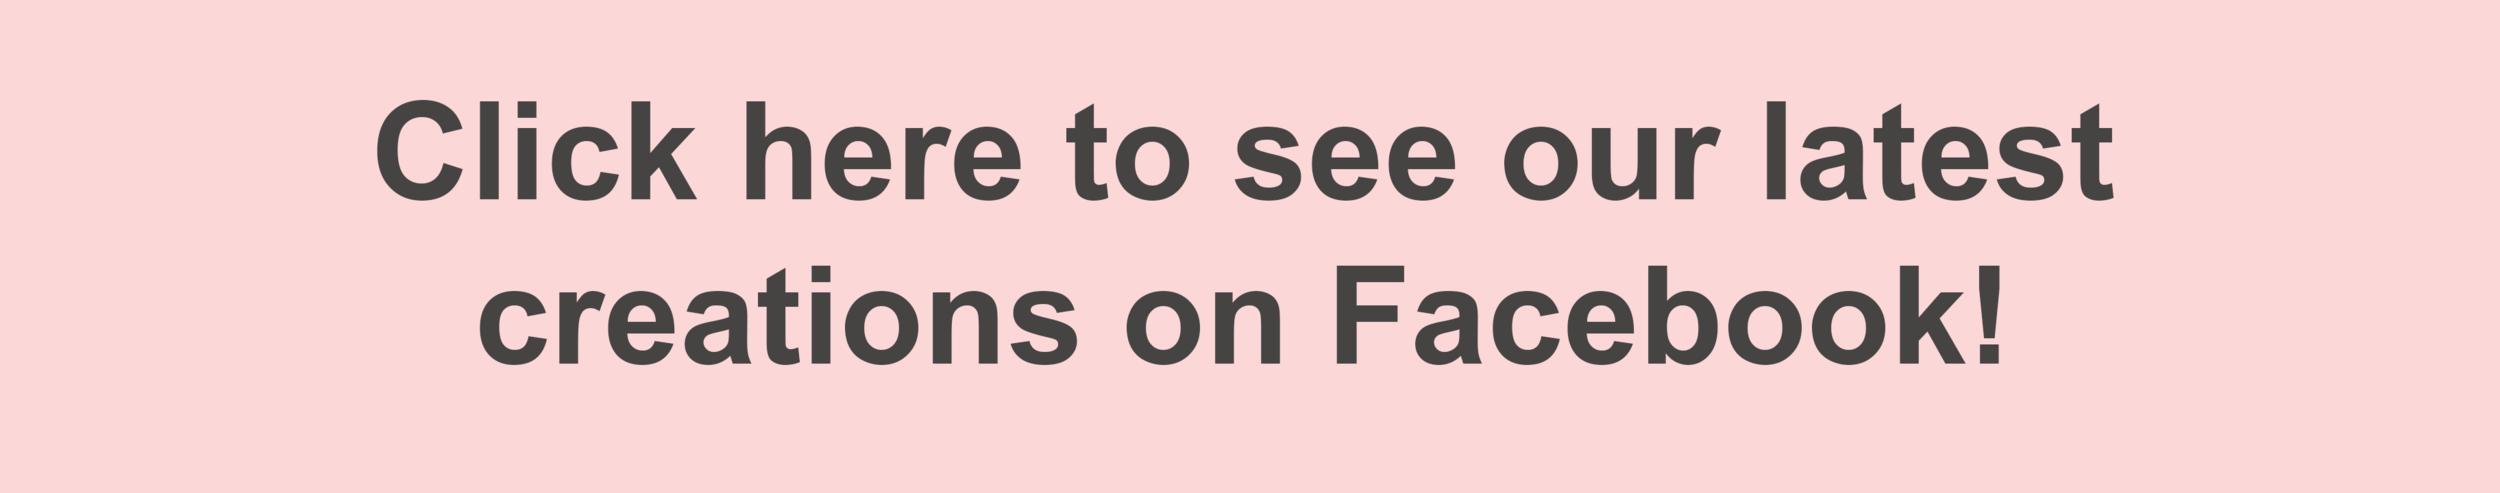 Facebook porfolio link - wide.png